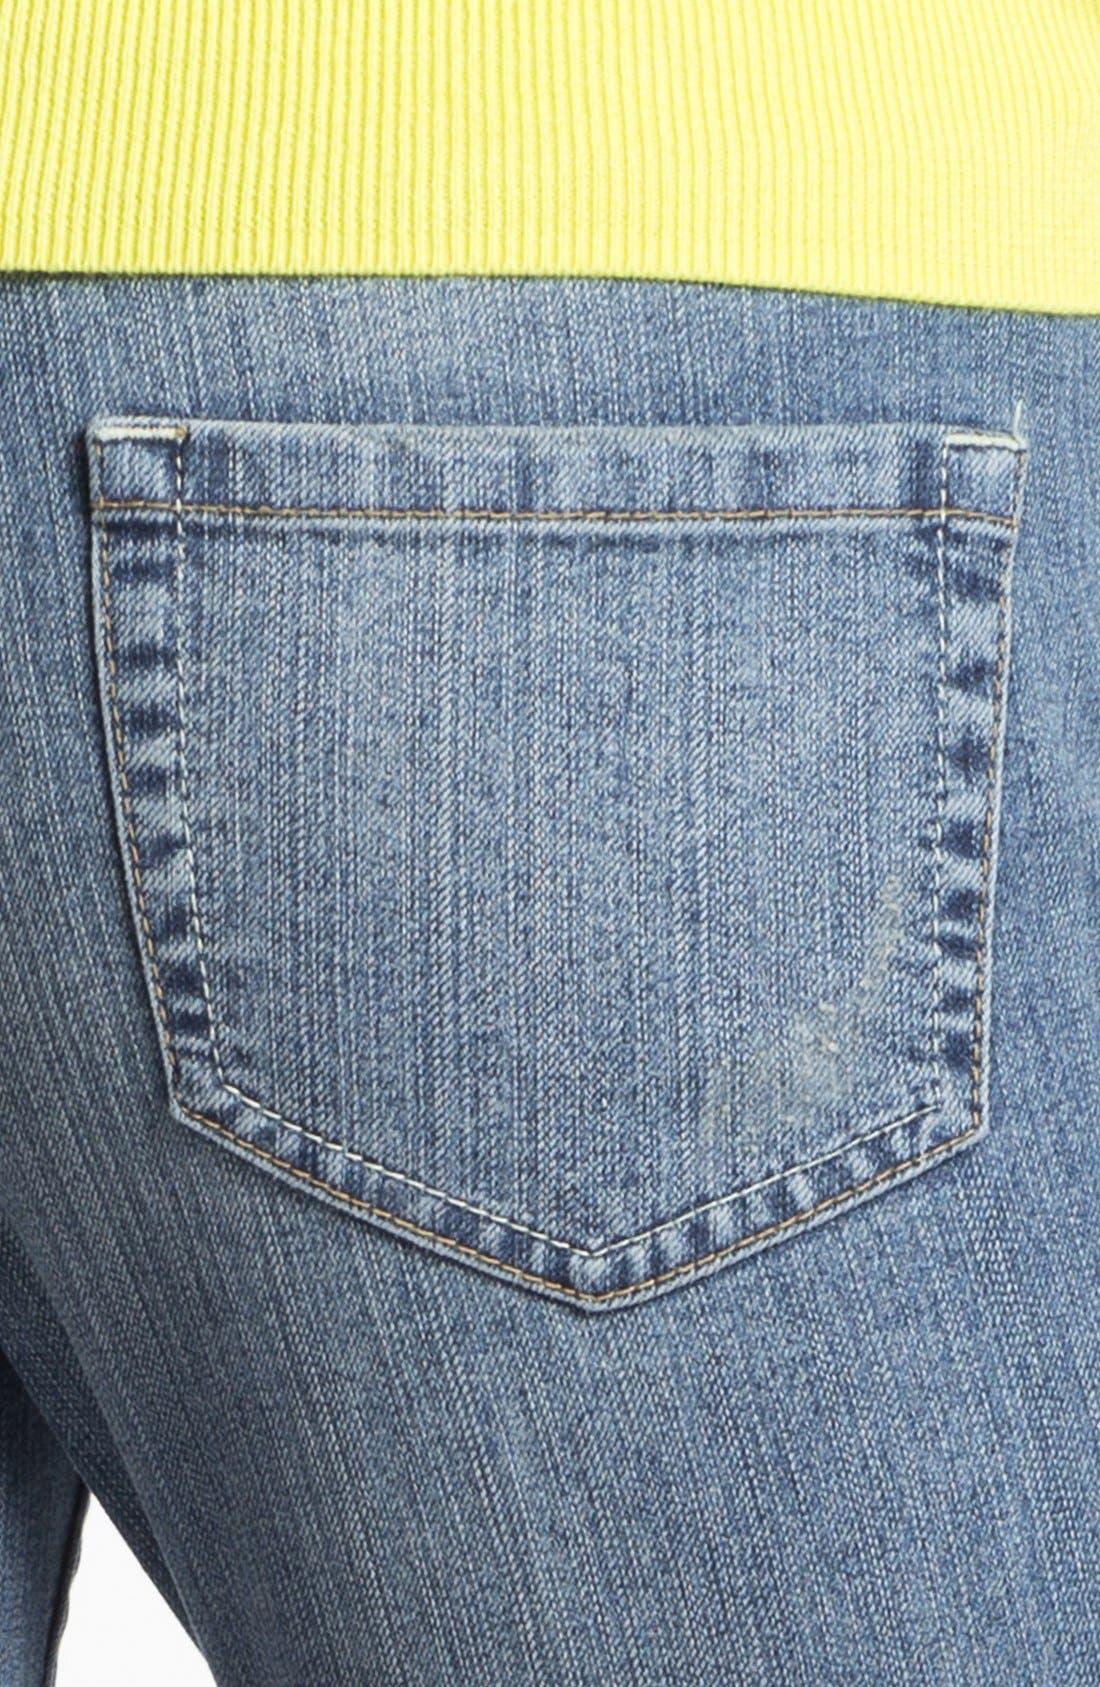 Alternate Image 3  - Jag Jeans 'Tommy' Skinny Crop Boyfriend Jeans